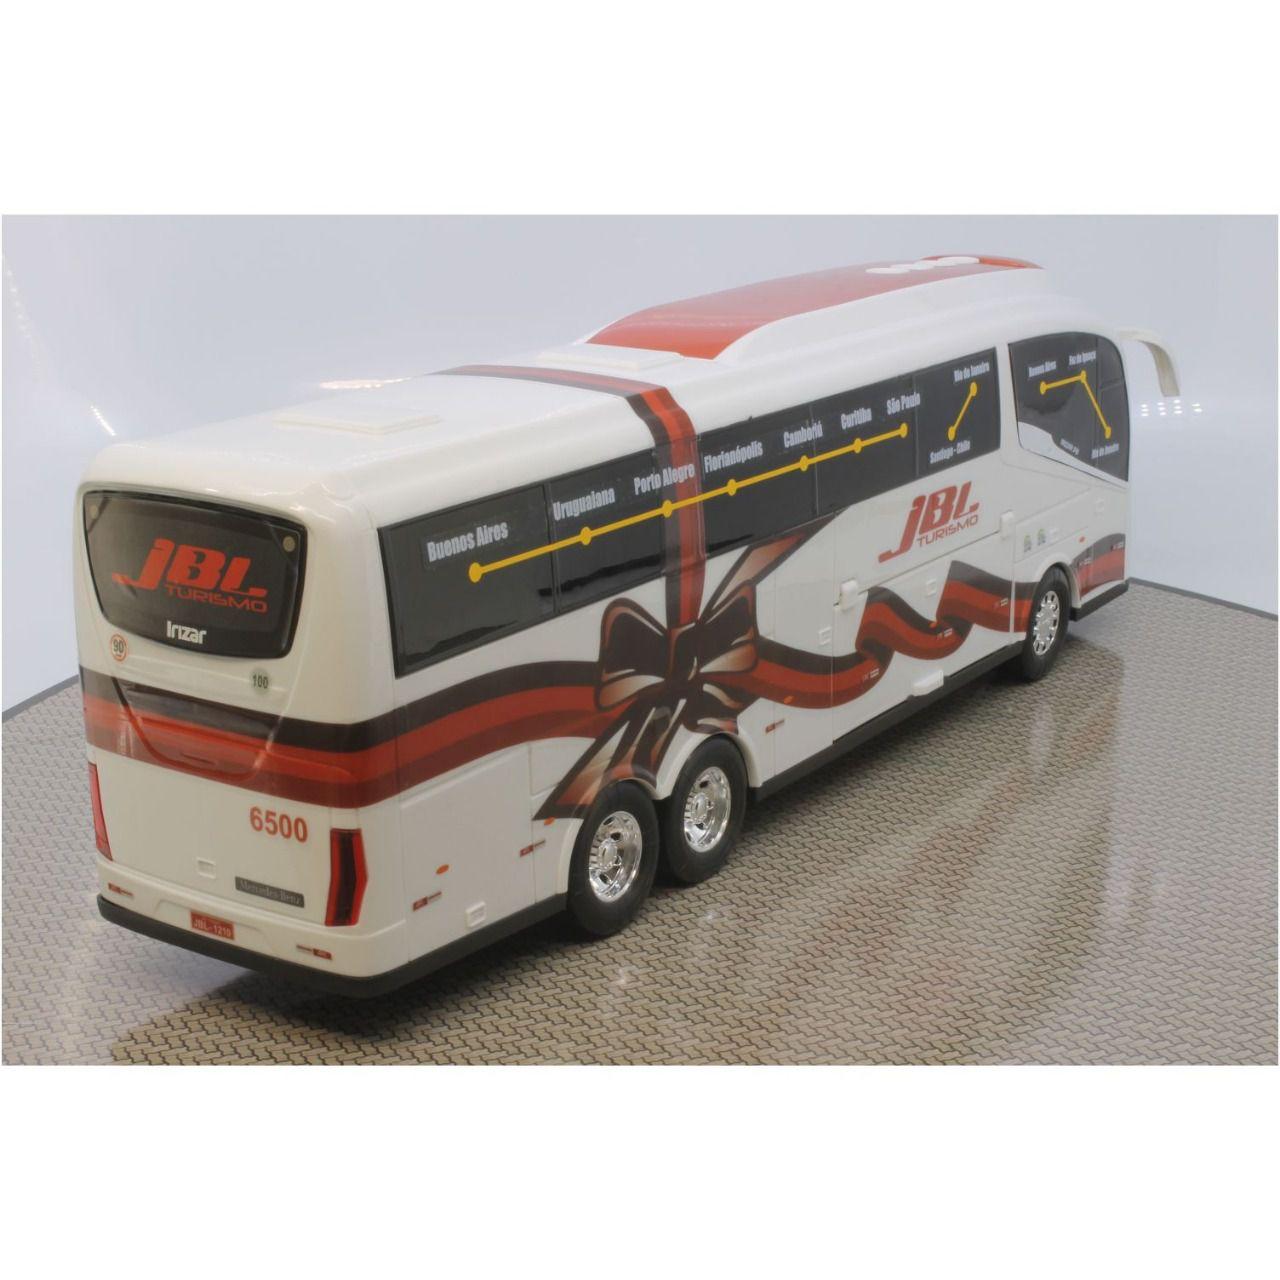 Ônibus Em Miniatura De Brinquedo JBL Turismo